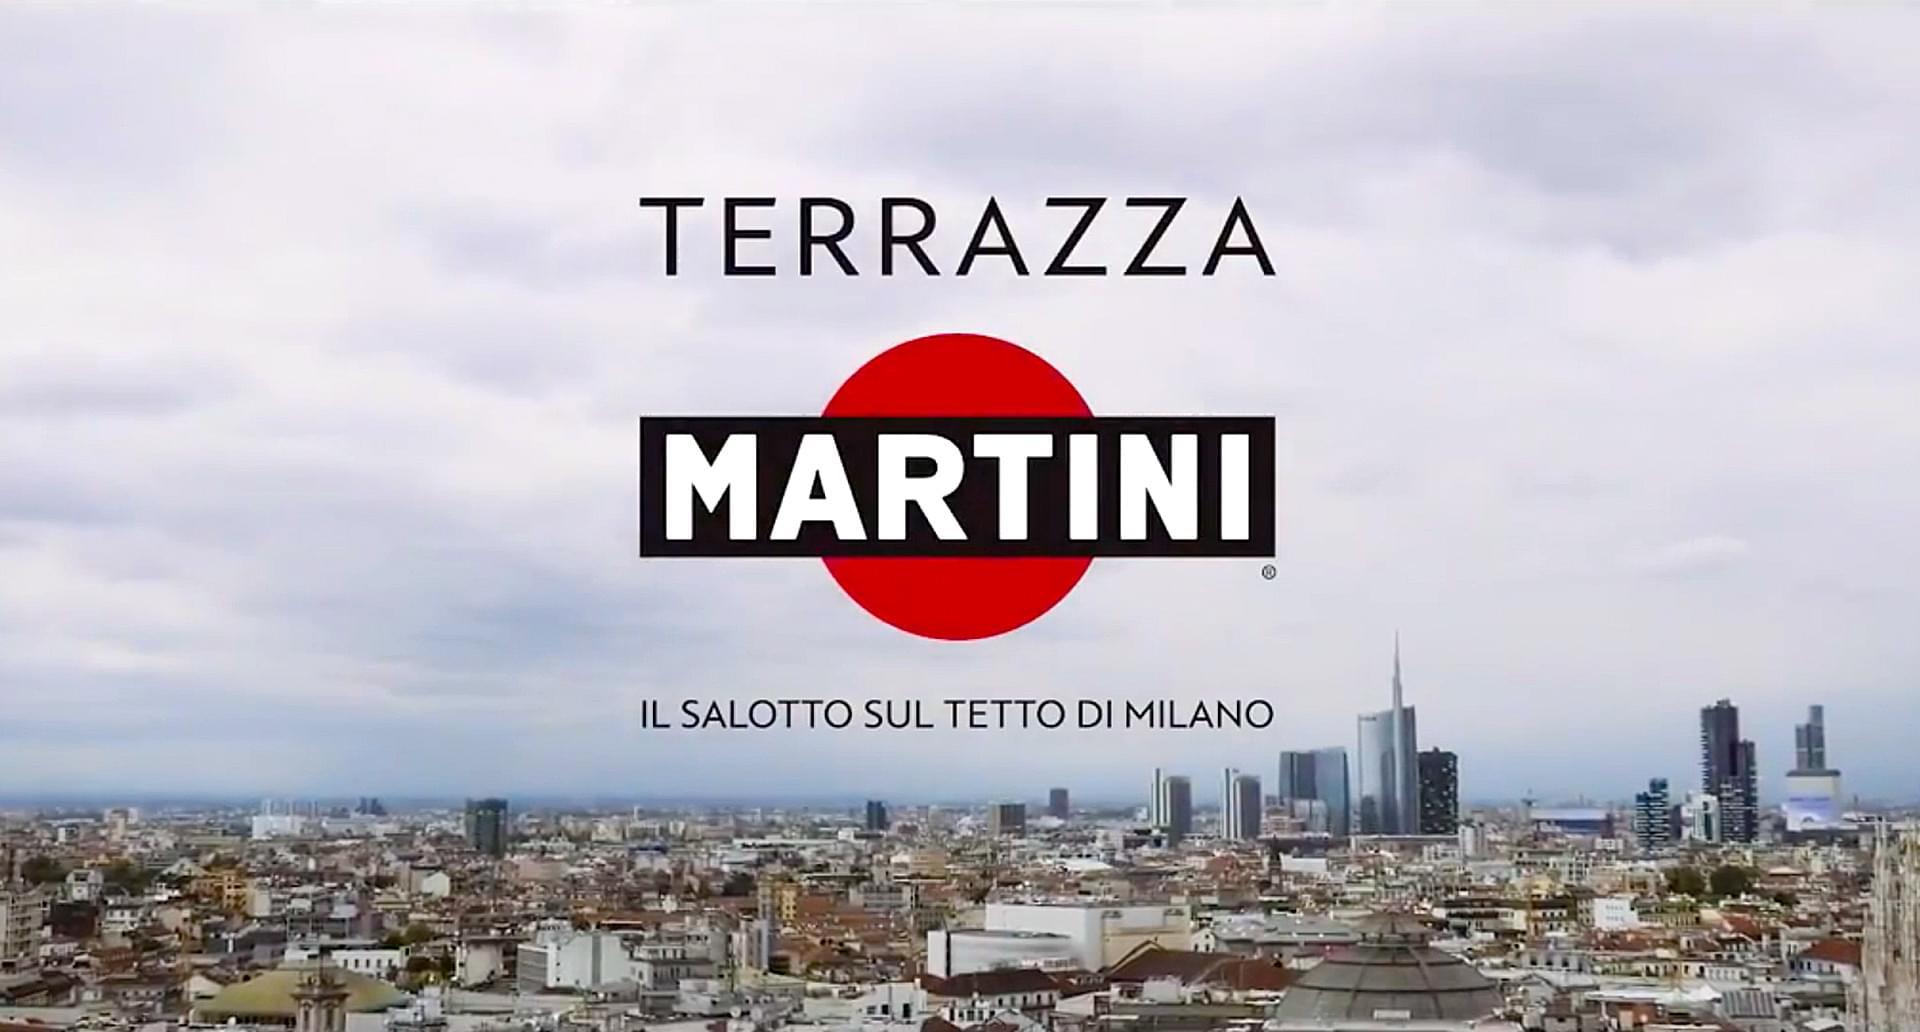 Terrazza Martini Milano – On the rooftop of Milano